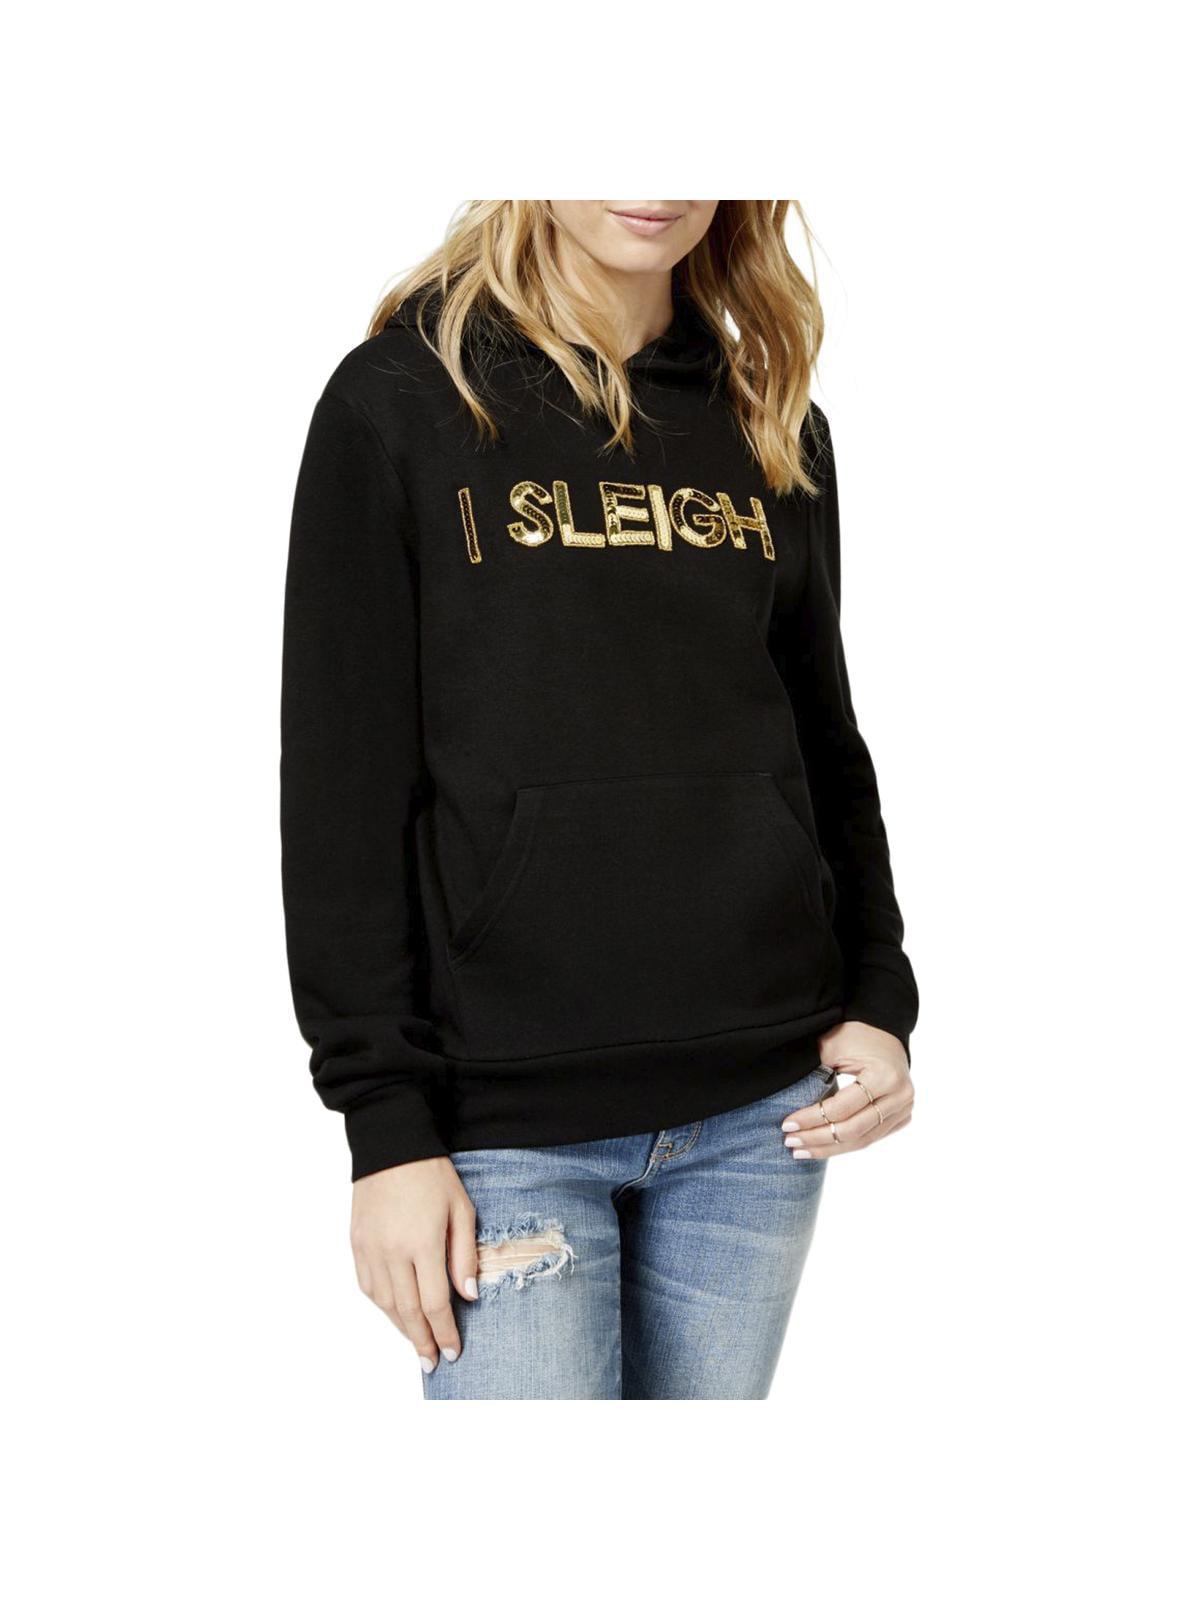 Bow & Drape Womens Juniors I Sleigh Winter Holiday Sweatshirt